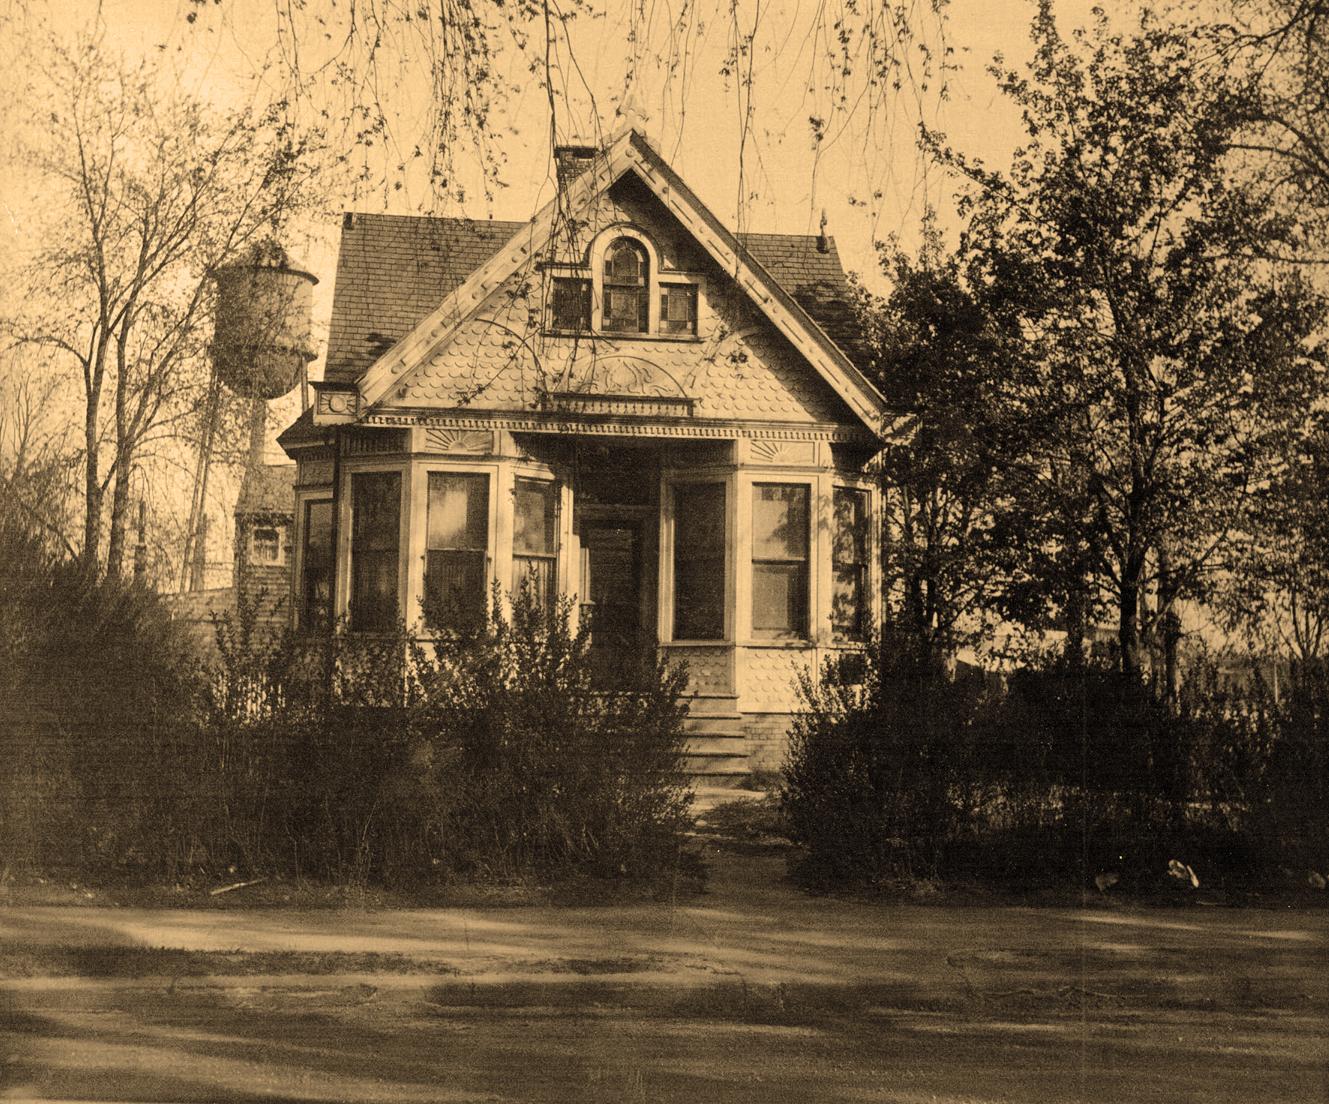 Aberdeen NJ Life: Van Wickle House - Prominent Matawan Family at ...